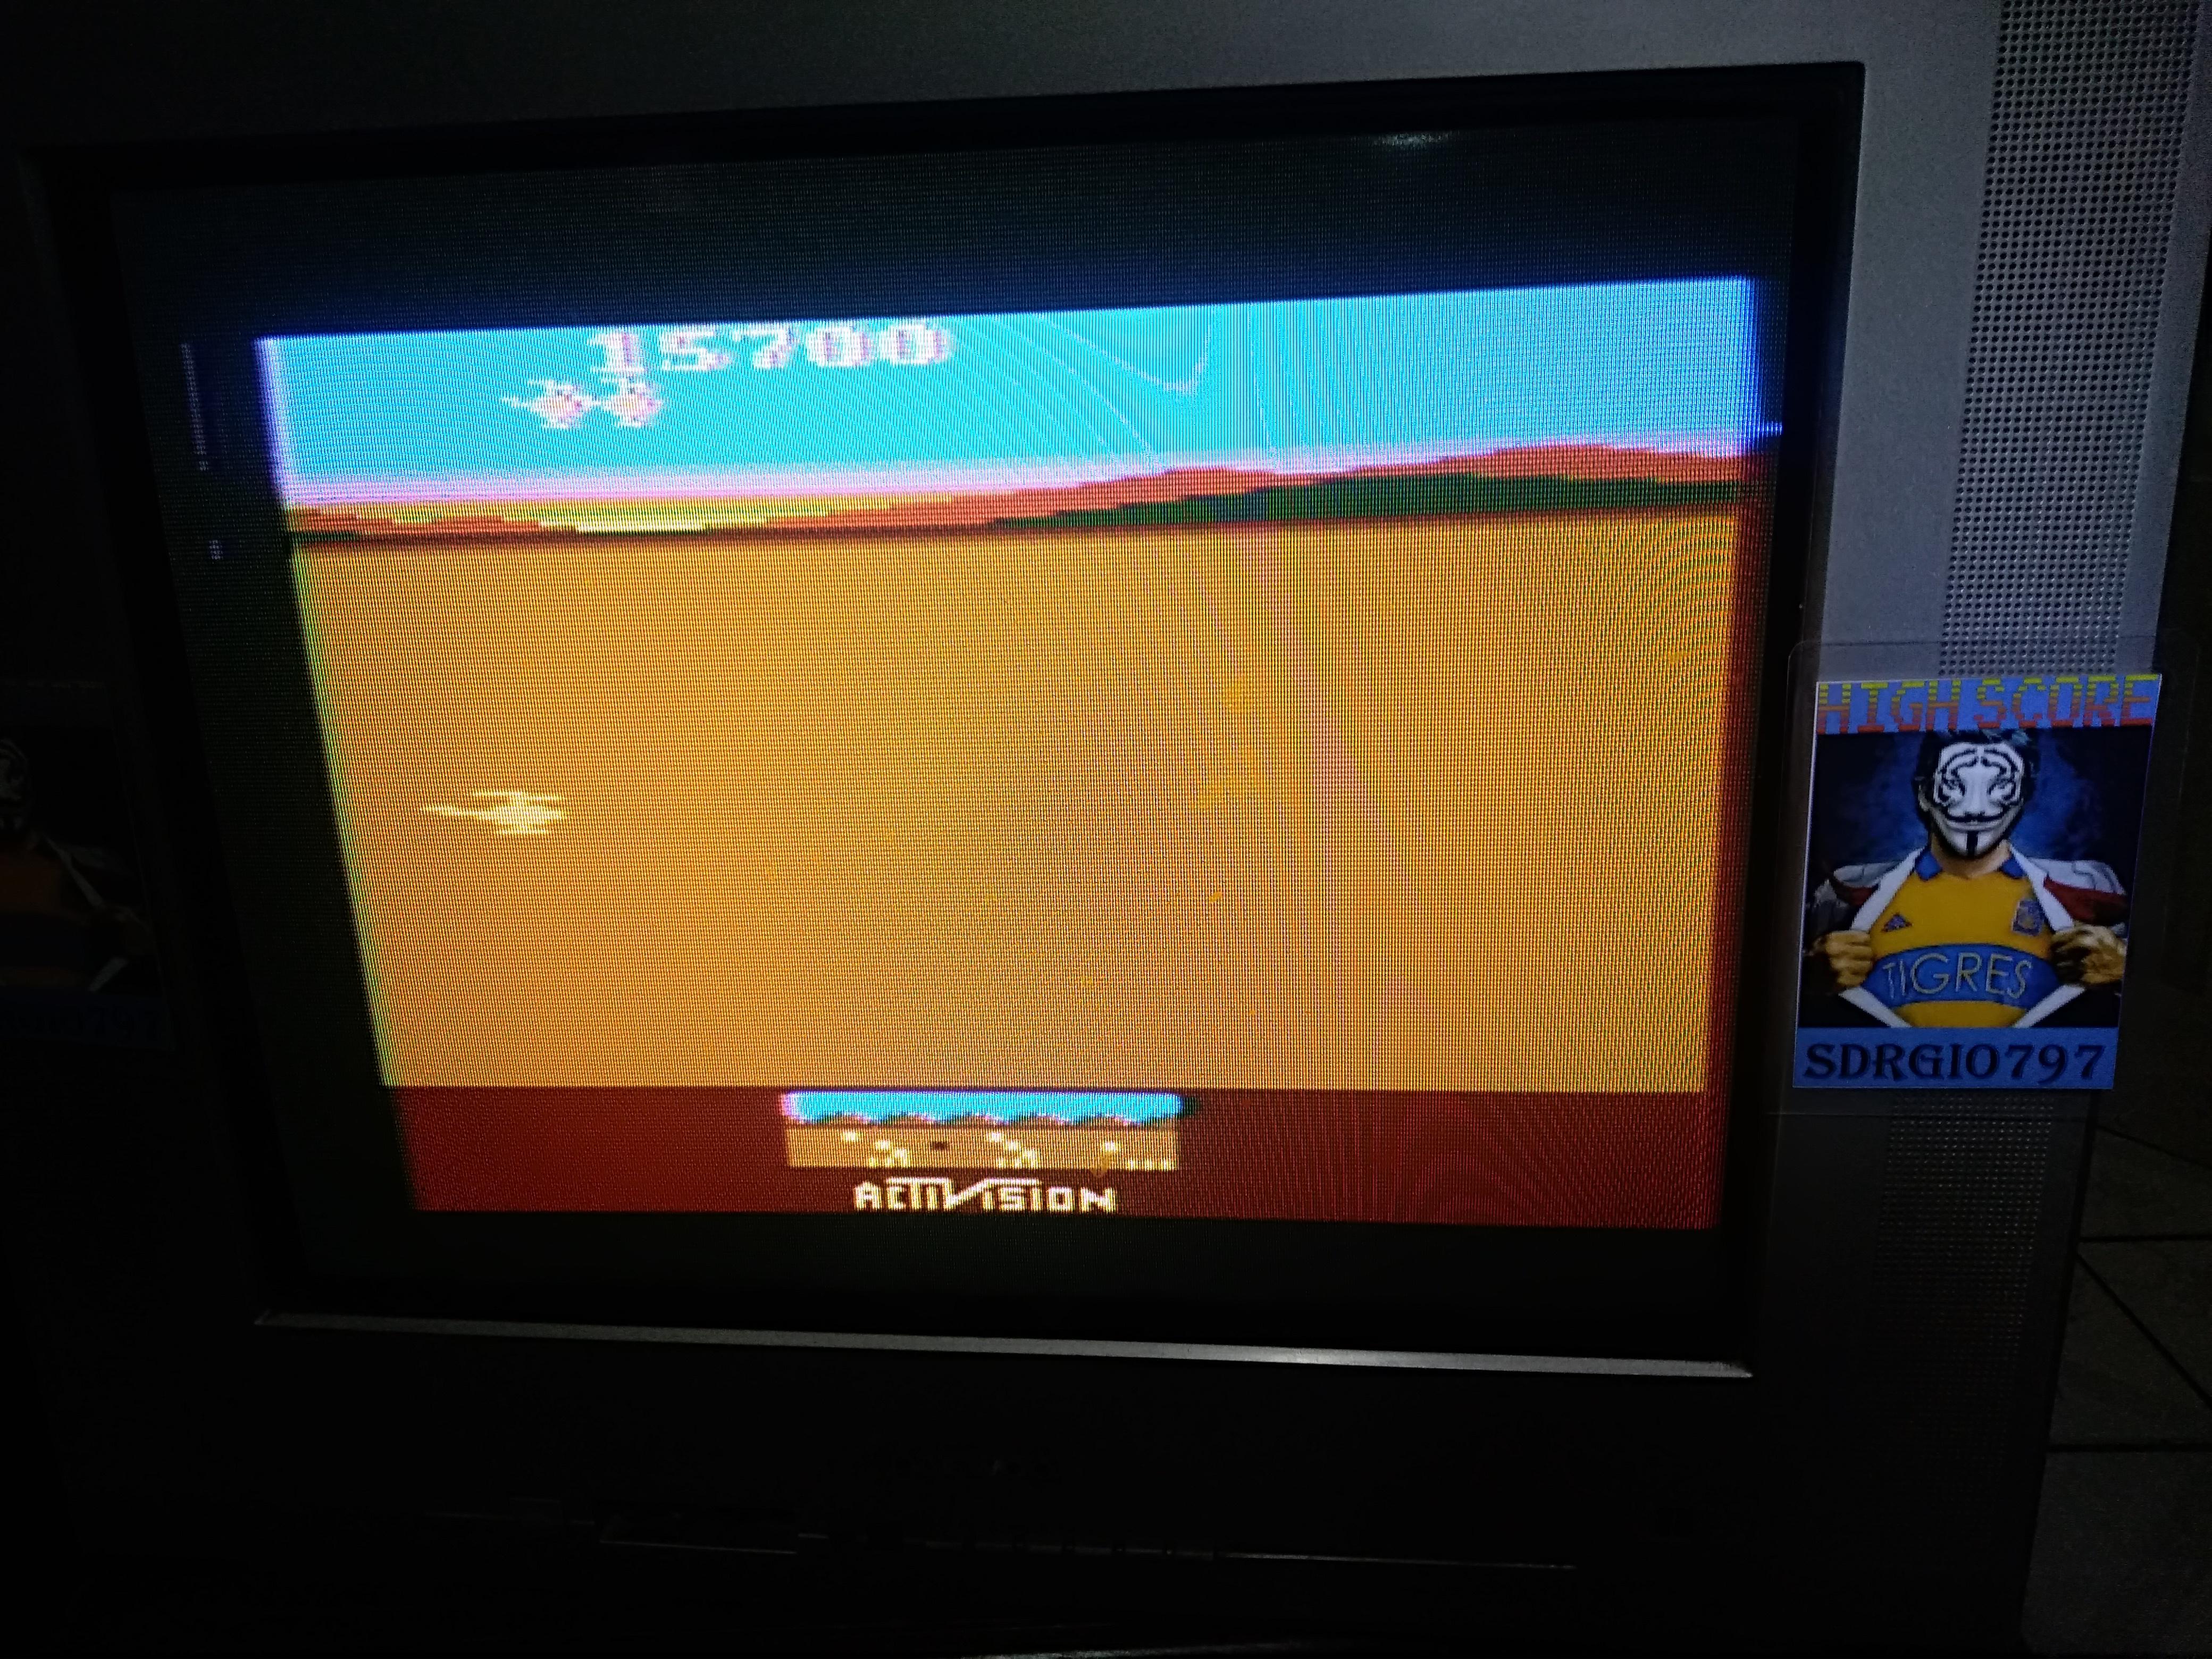 Sdrgio797: Chopper Command [1 Life Only] (Atari 2600 Novice/B) 15,700 points on 2020-08-11 19:59:34